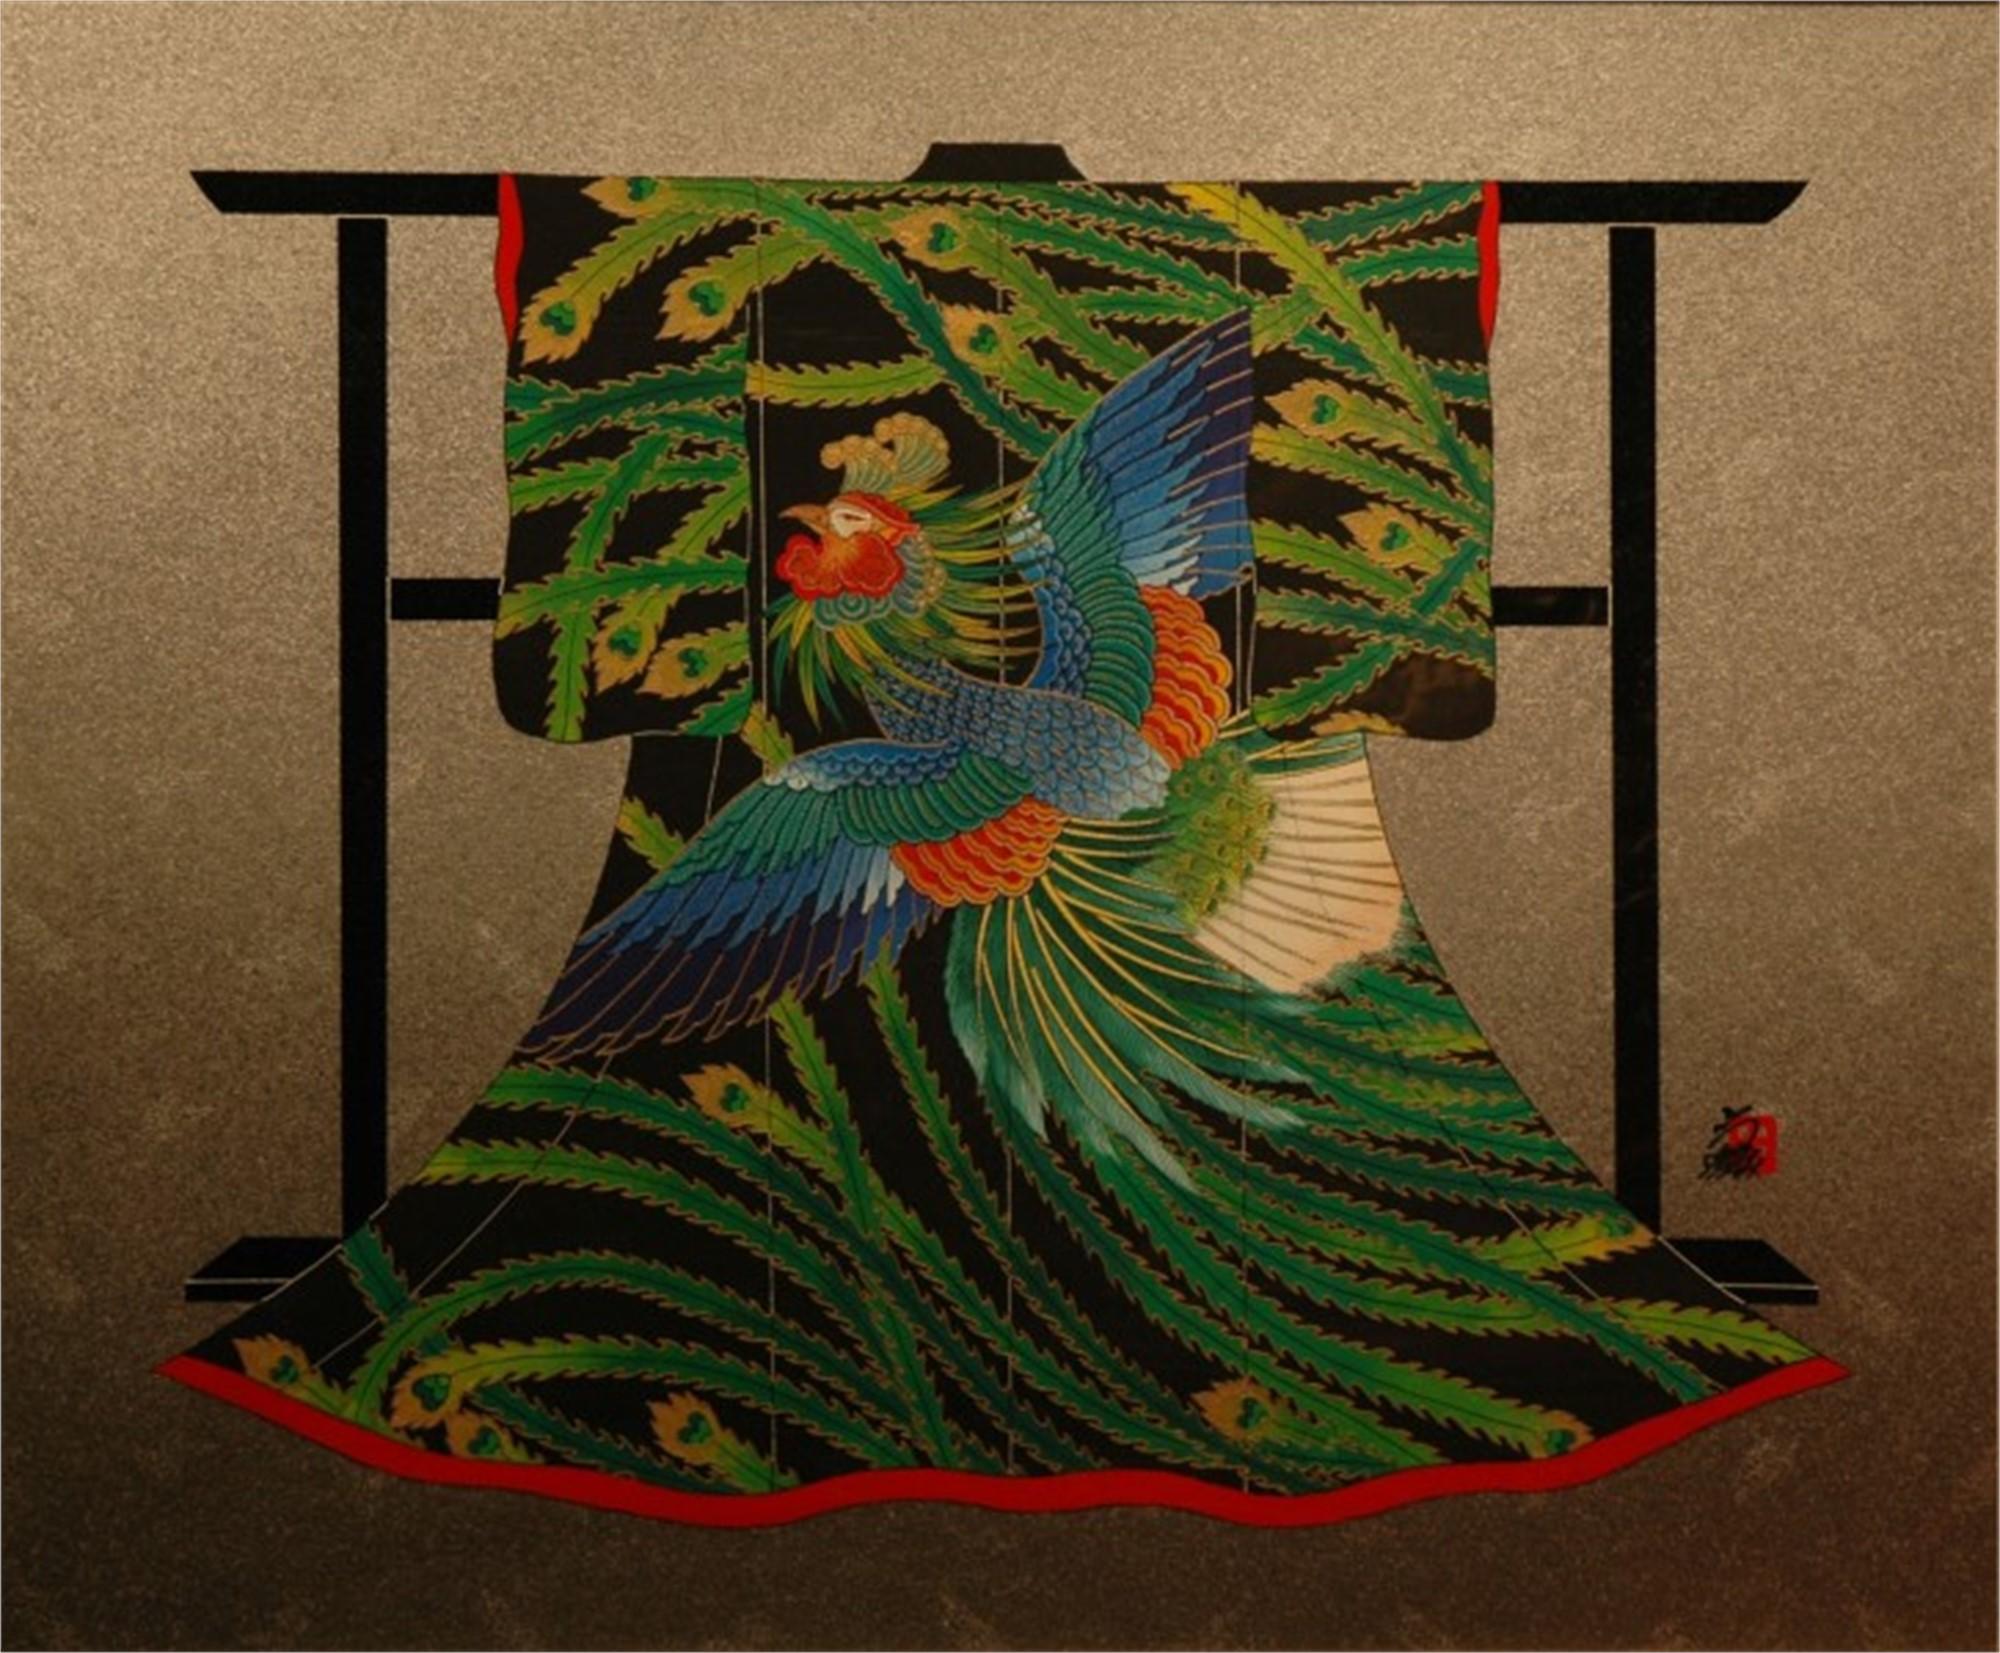 Phoenix by Hisashi Otsuka